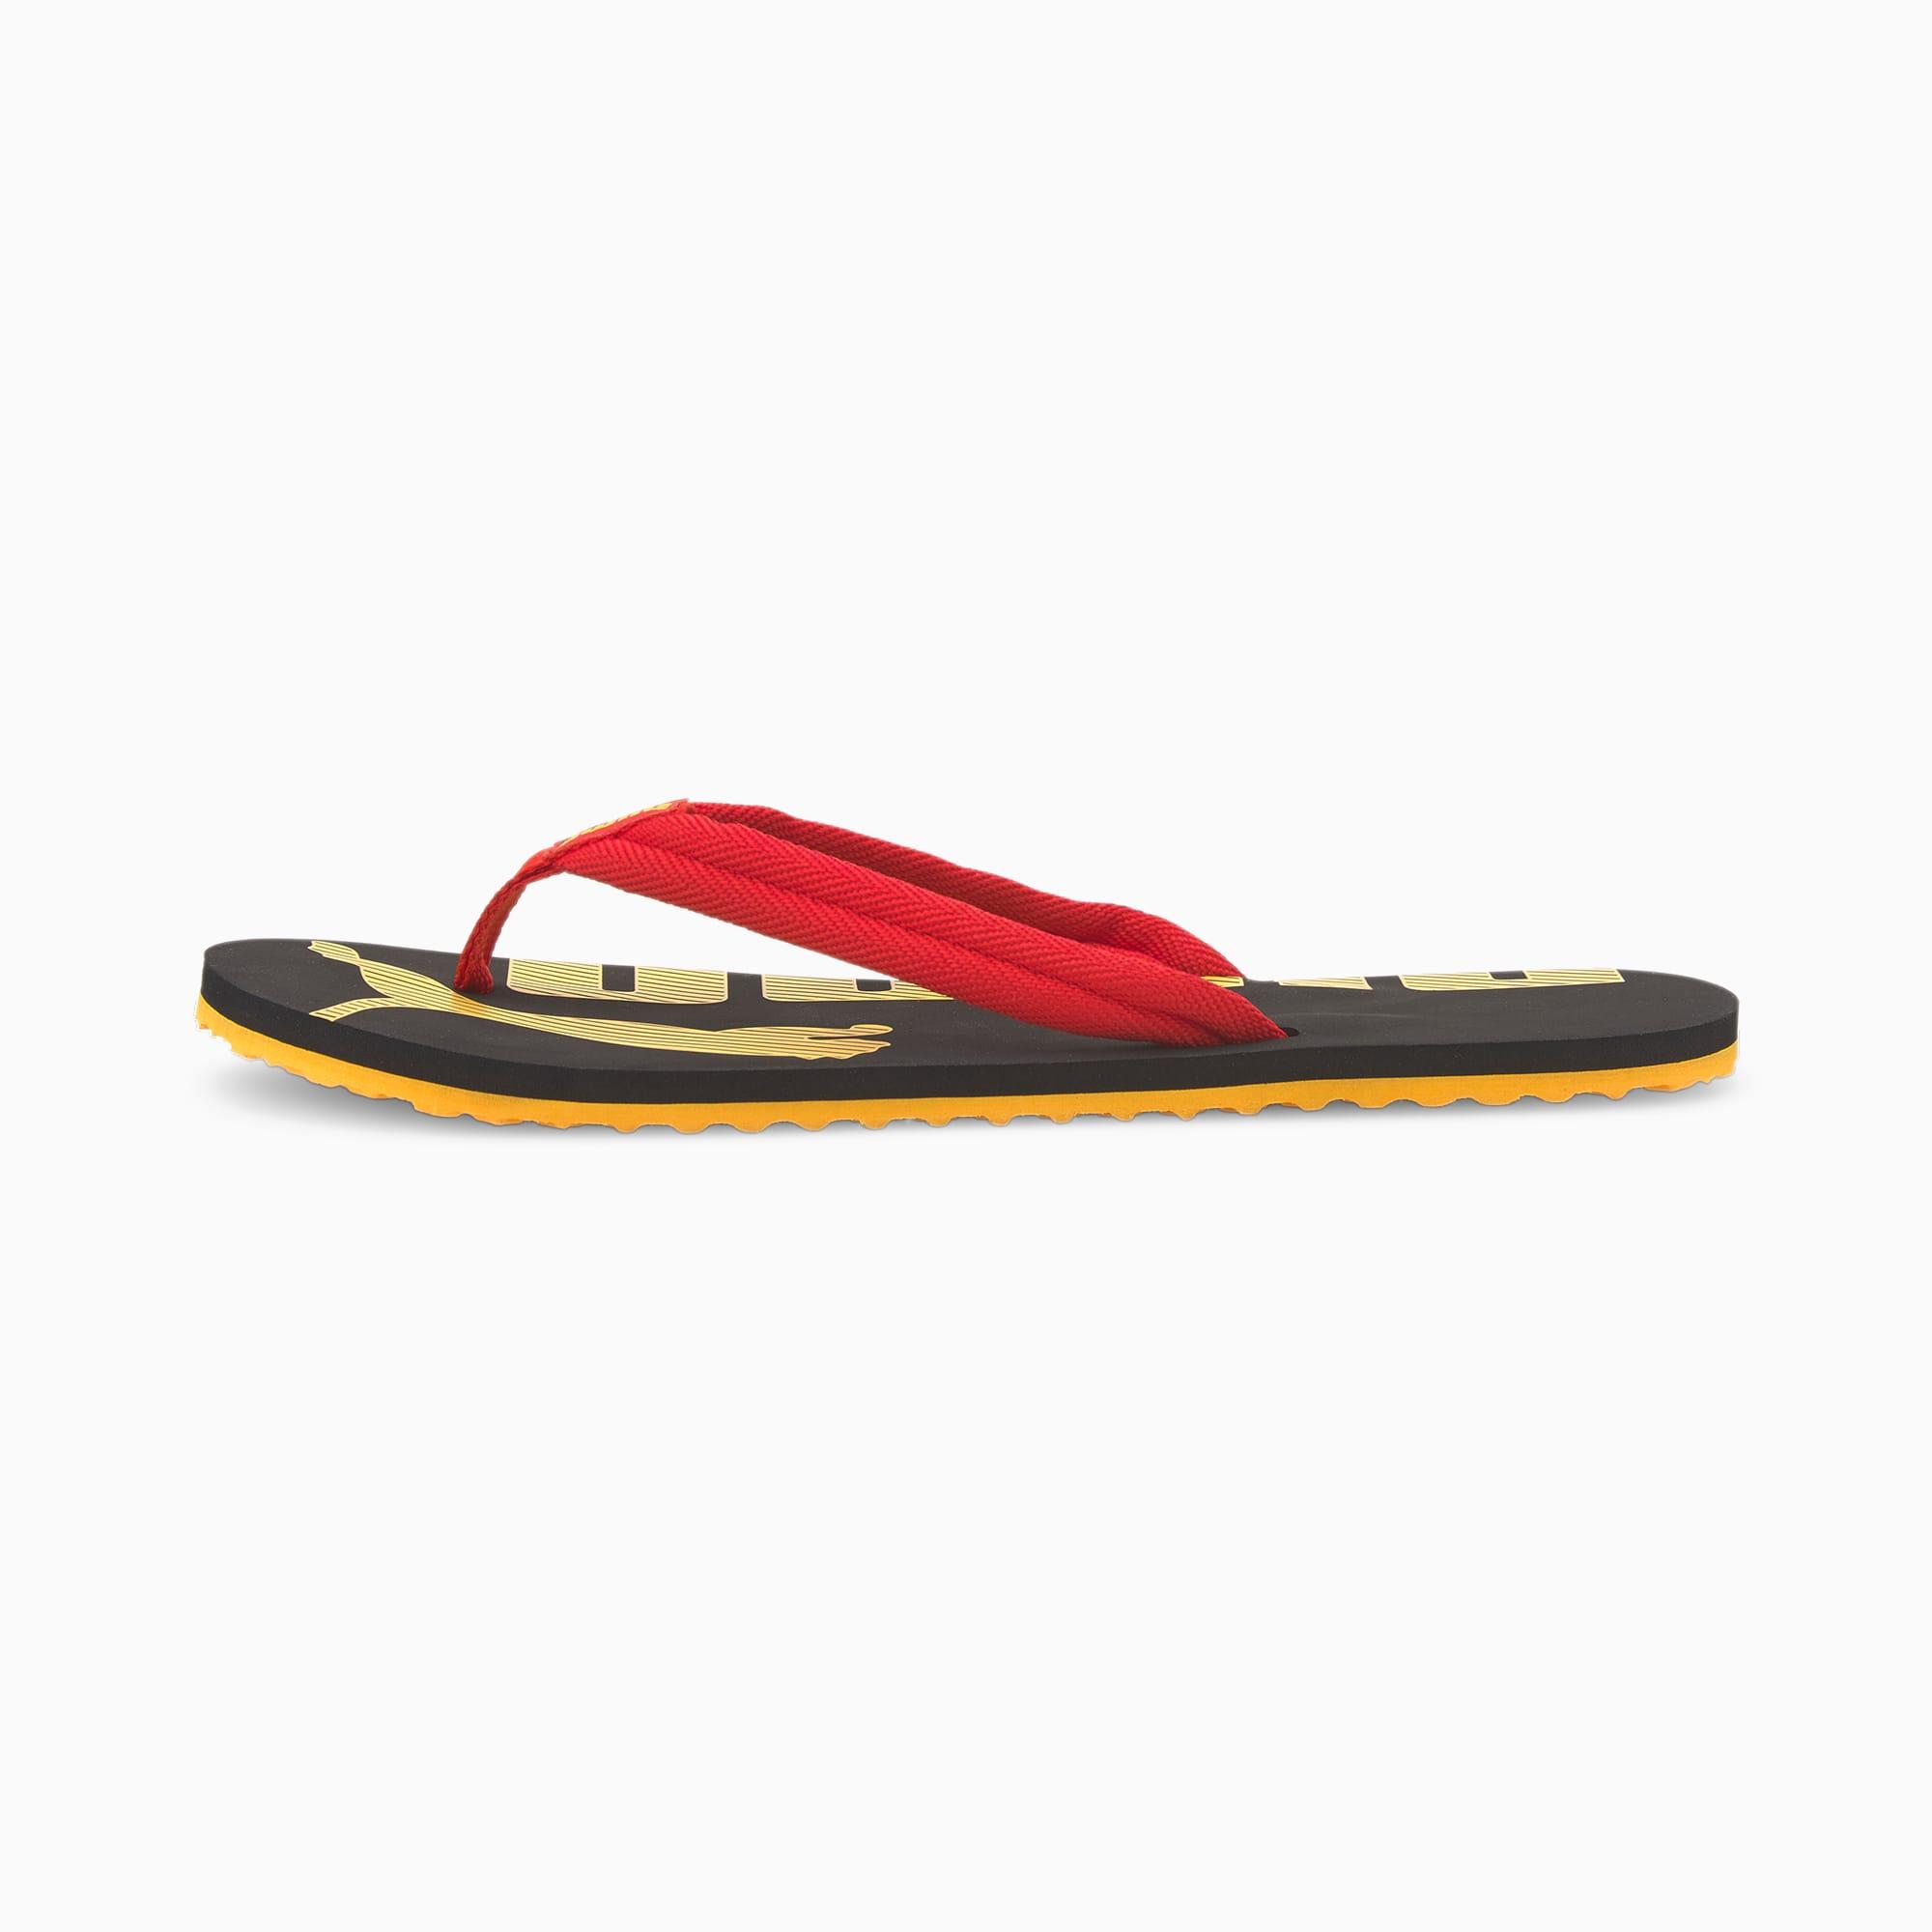 puma -  Epic Flip v2 Sandalen   Rot   Größe: 40.5